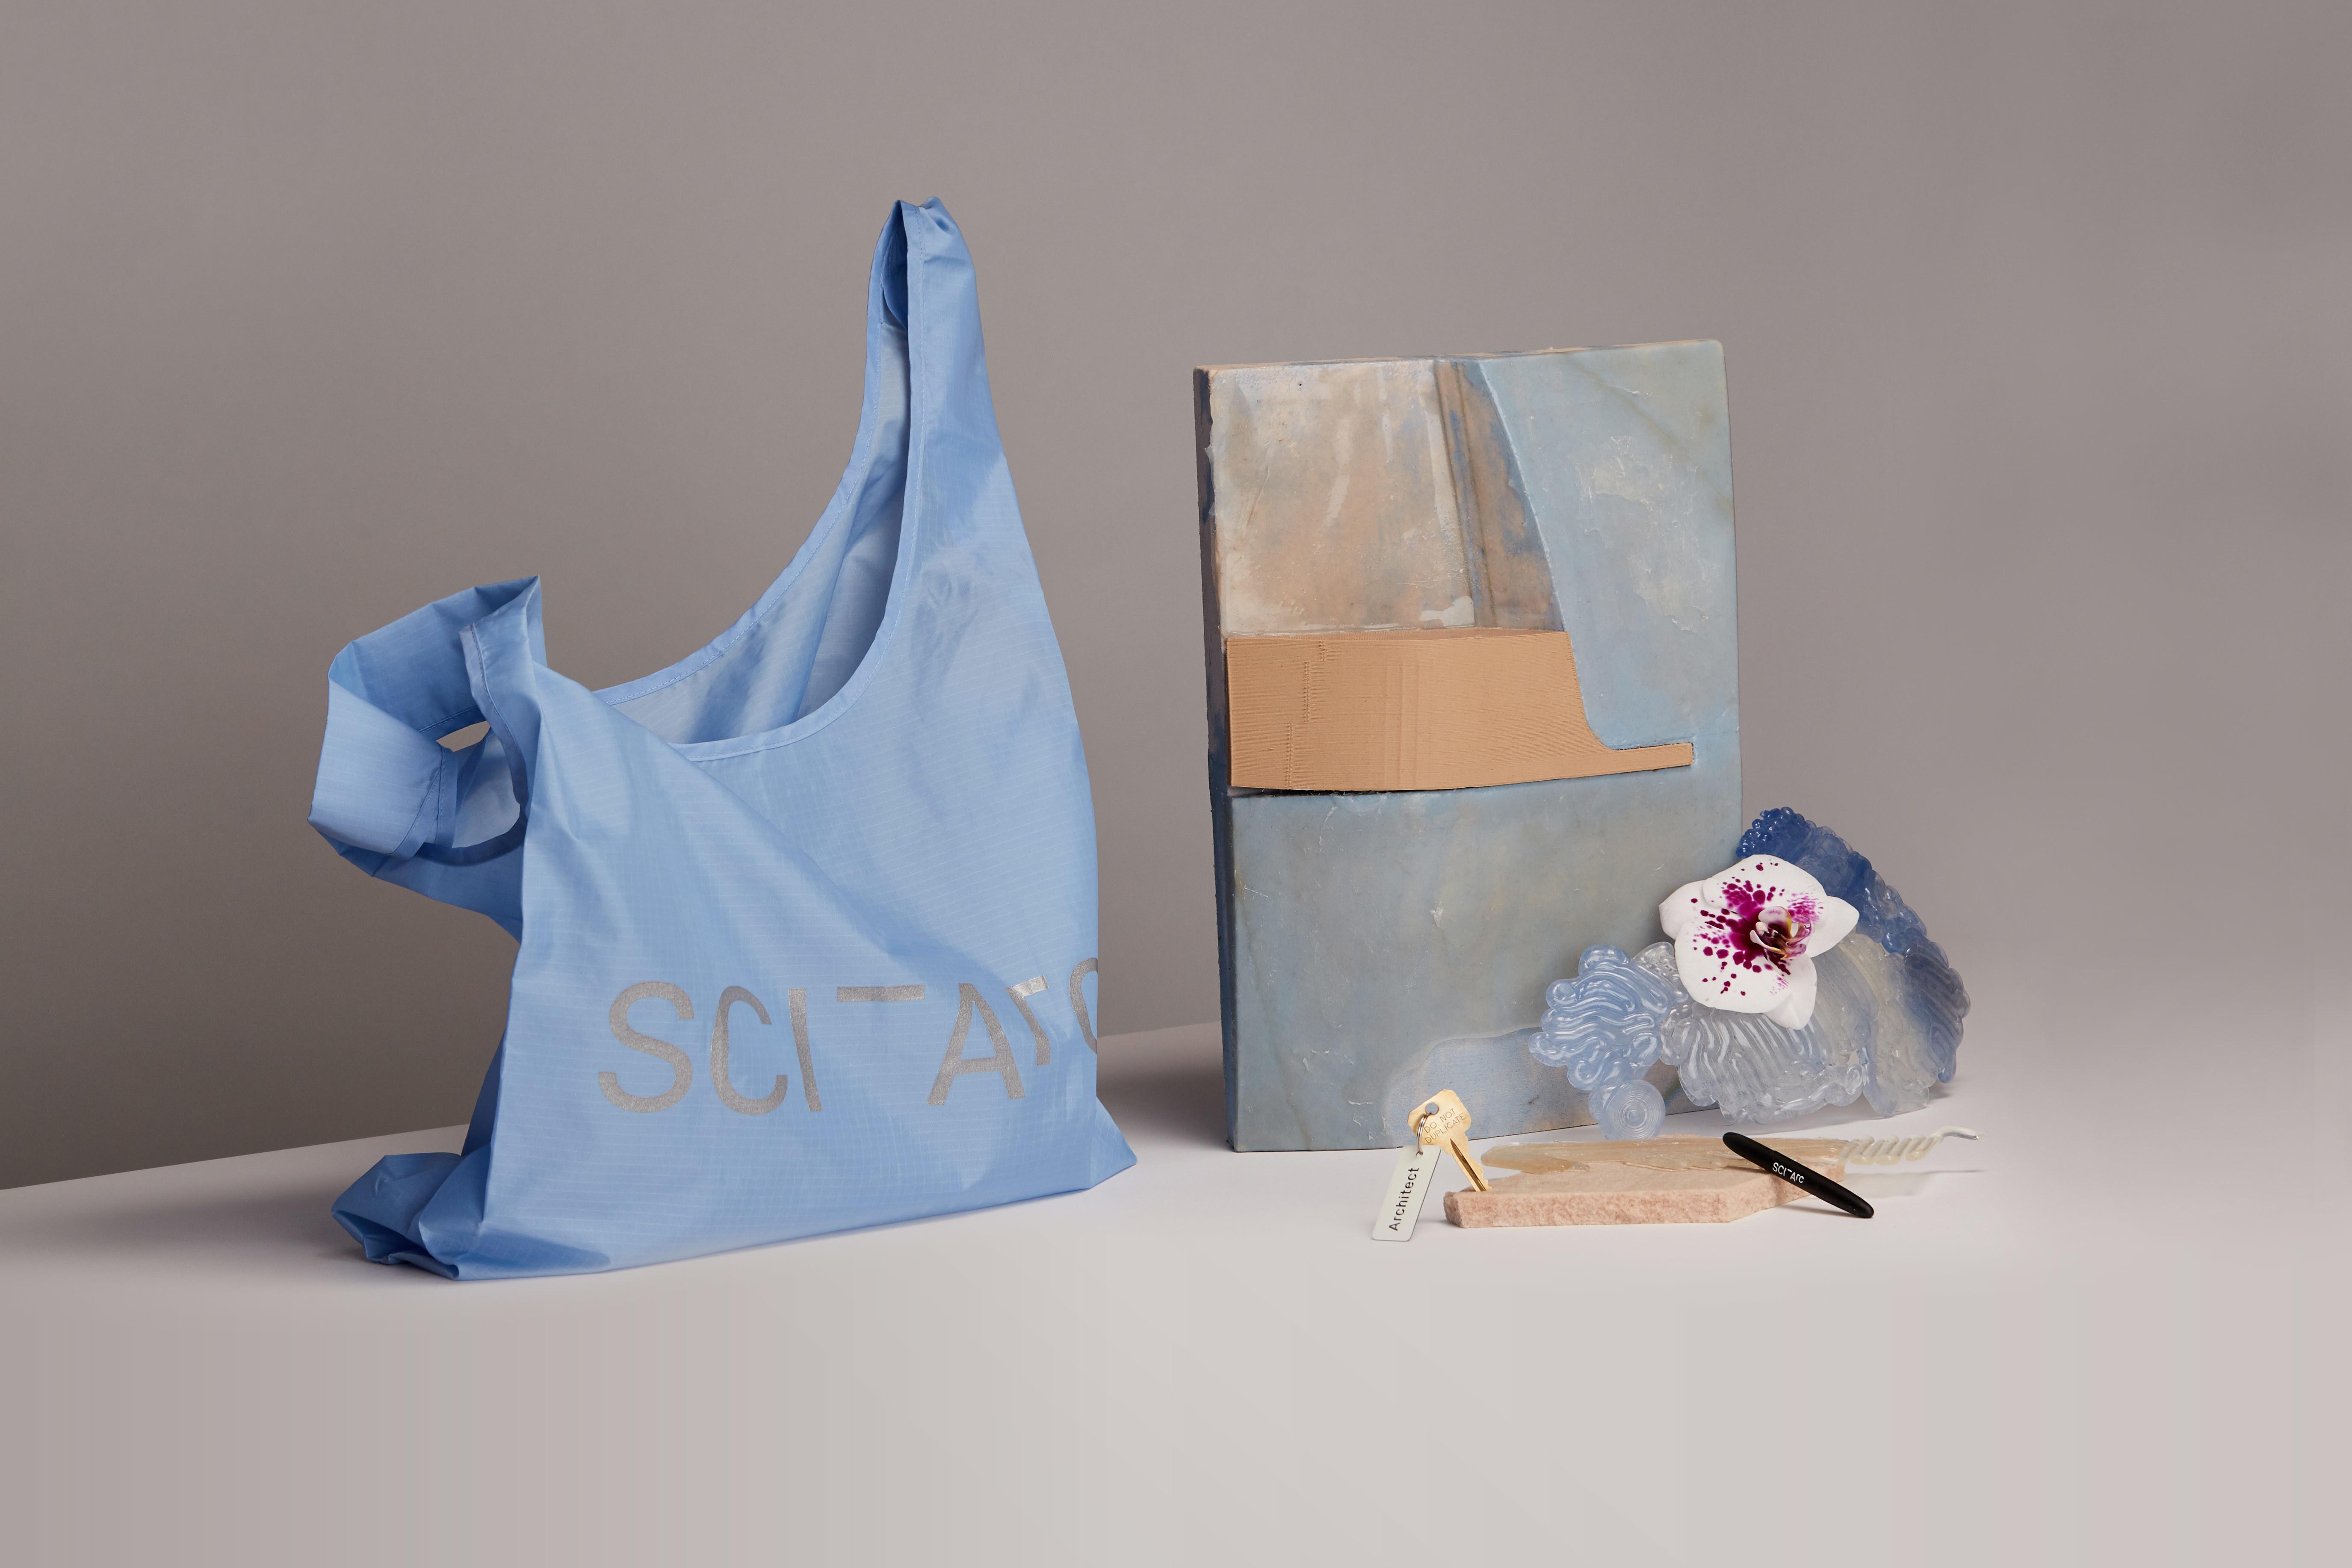 sciarc logo blue ripstop bag in still life